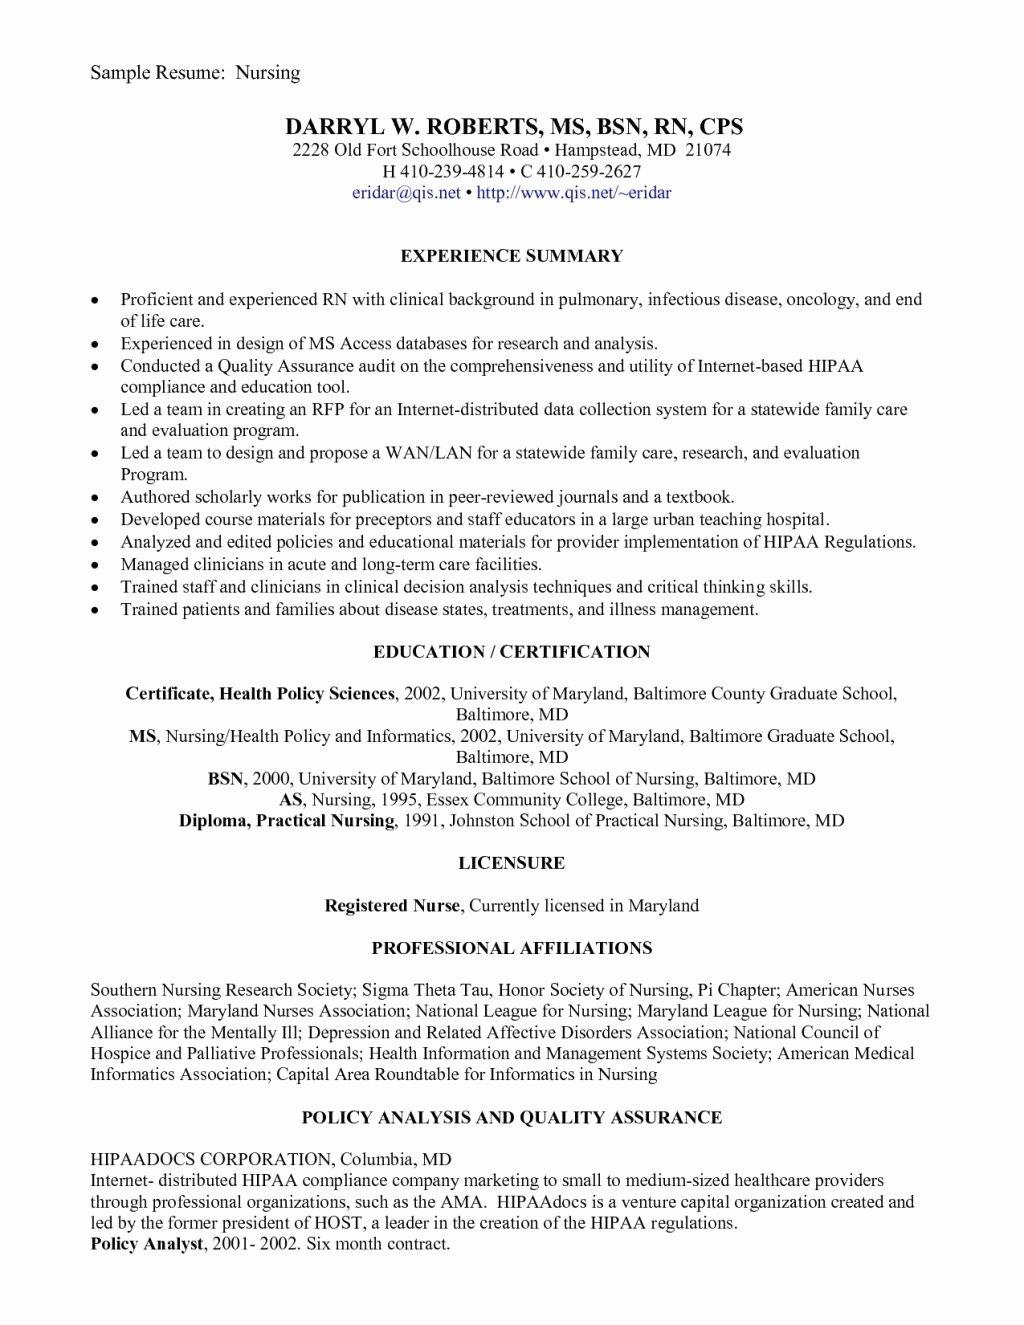 Graduate Nurse Resume Template Free Awesome Entry Level Rn Resume Template Free Tag 55 New Grad Rn